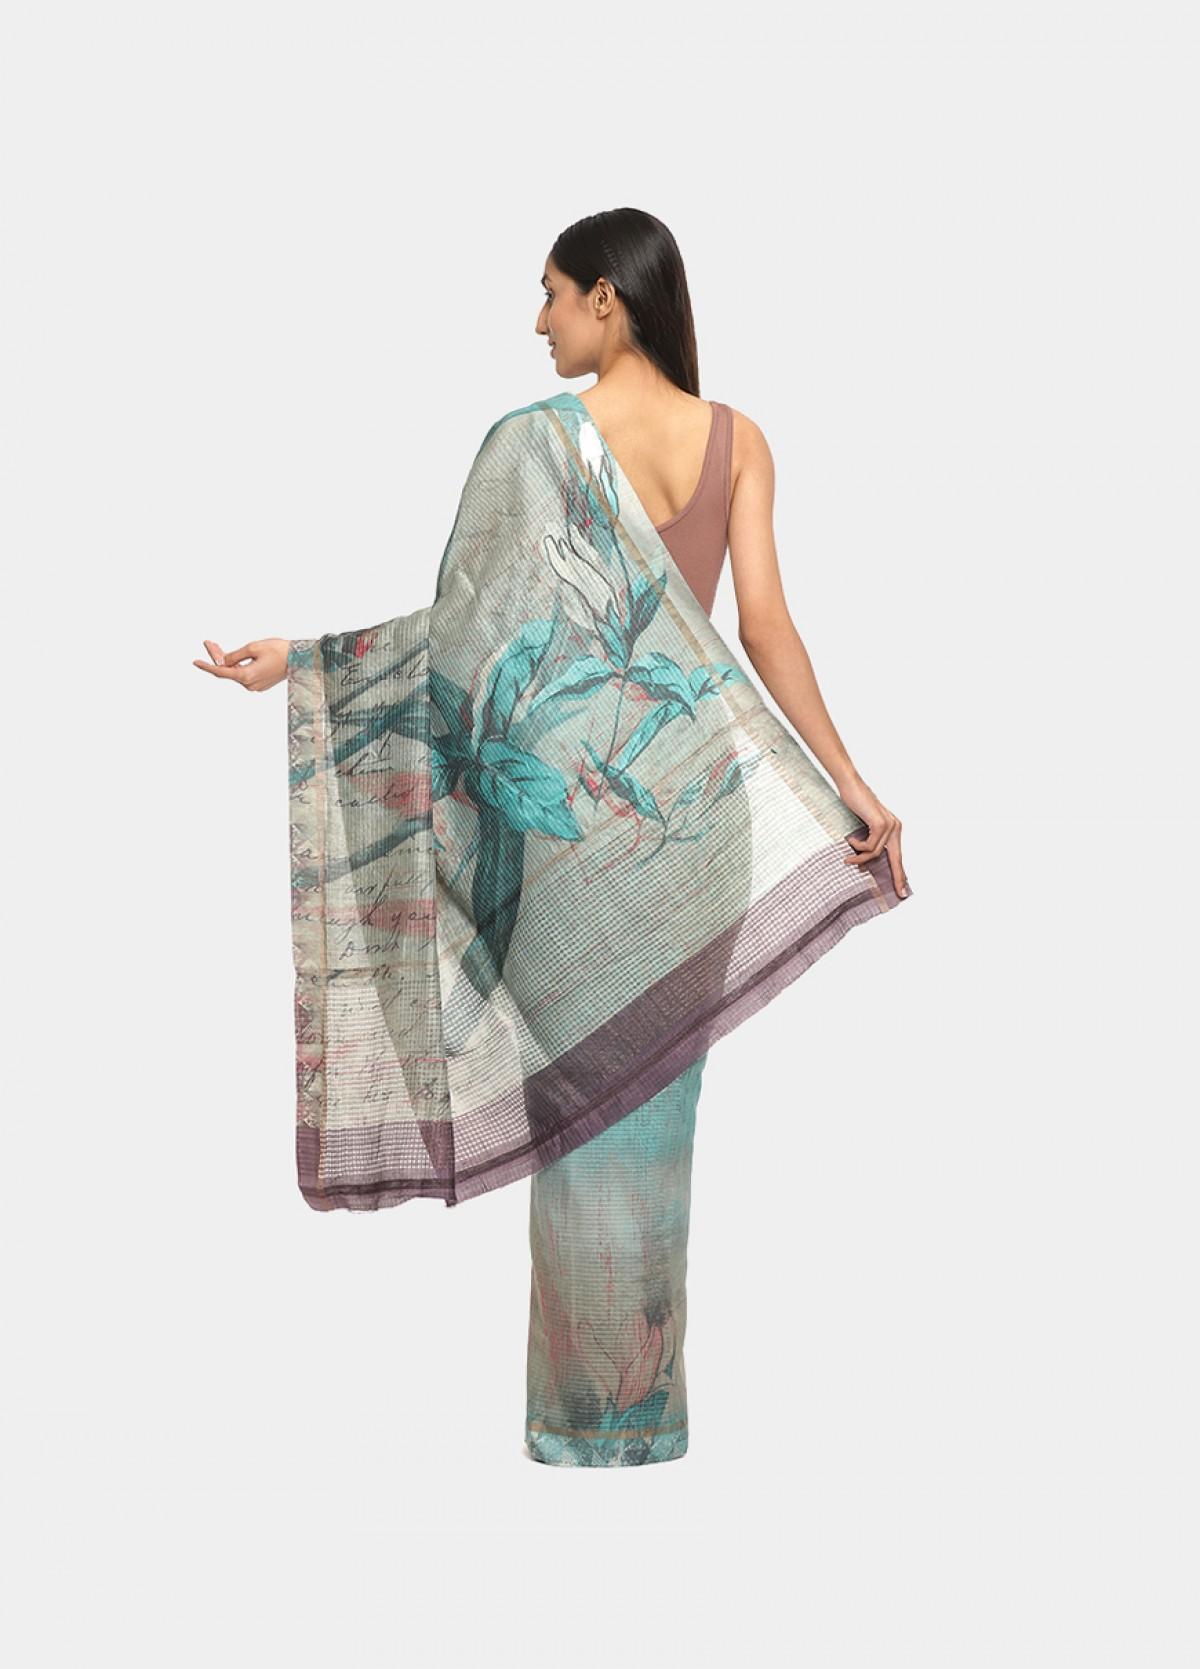 The Haldi Sari